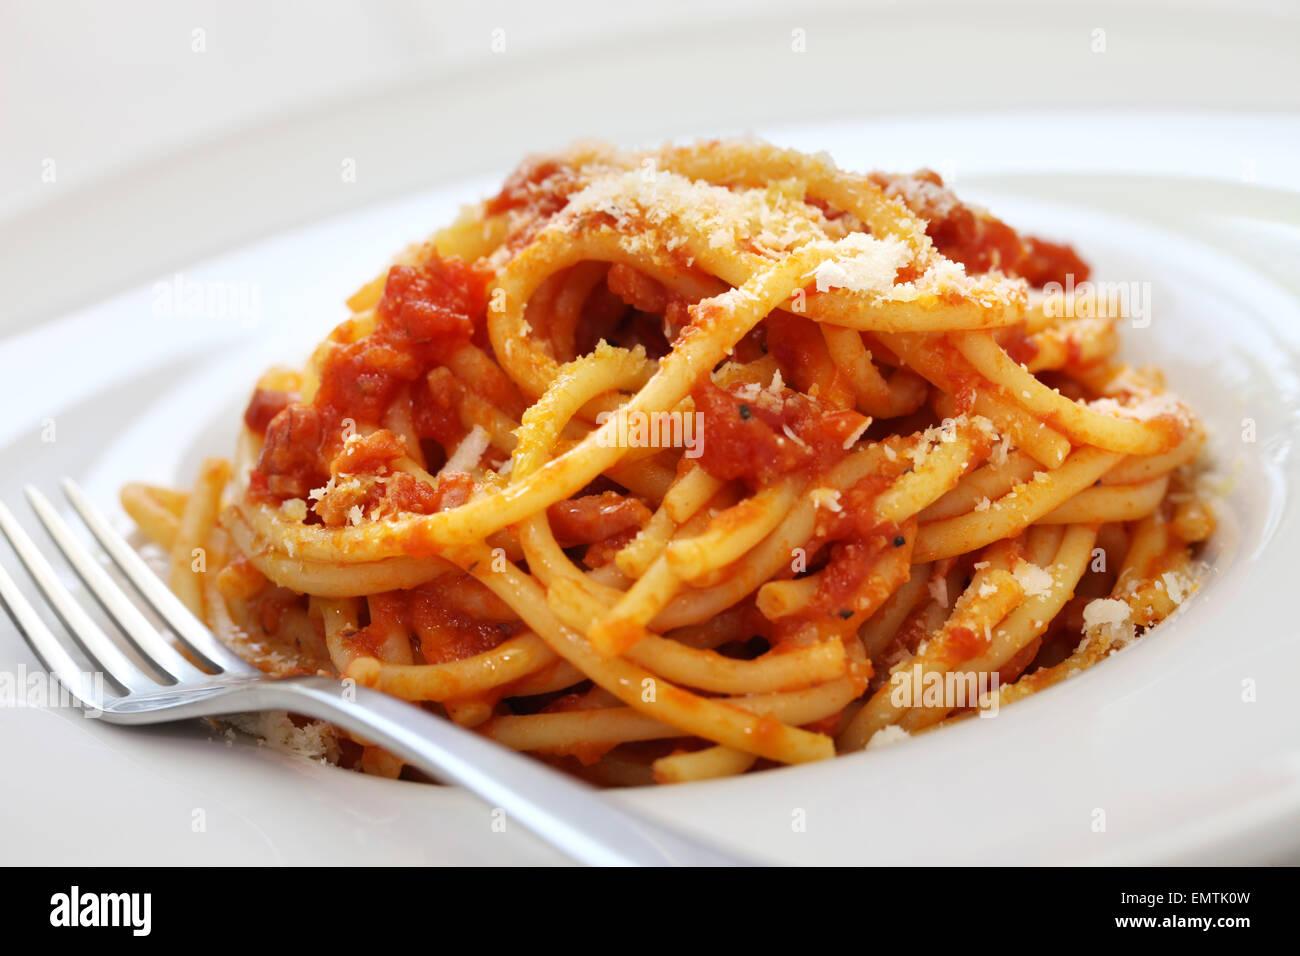 Bucatini alla amatriciana, salsa de tomate pasta italiana Imagen De Stock